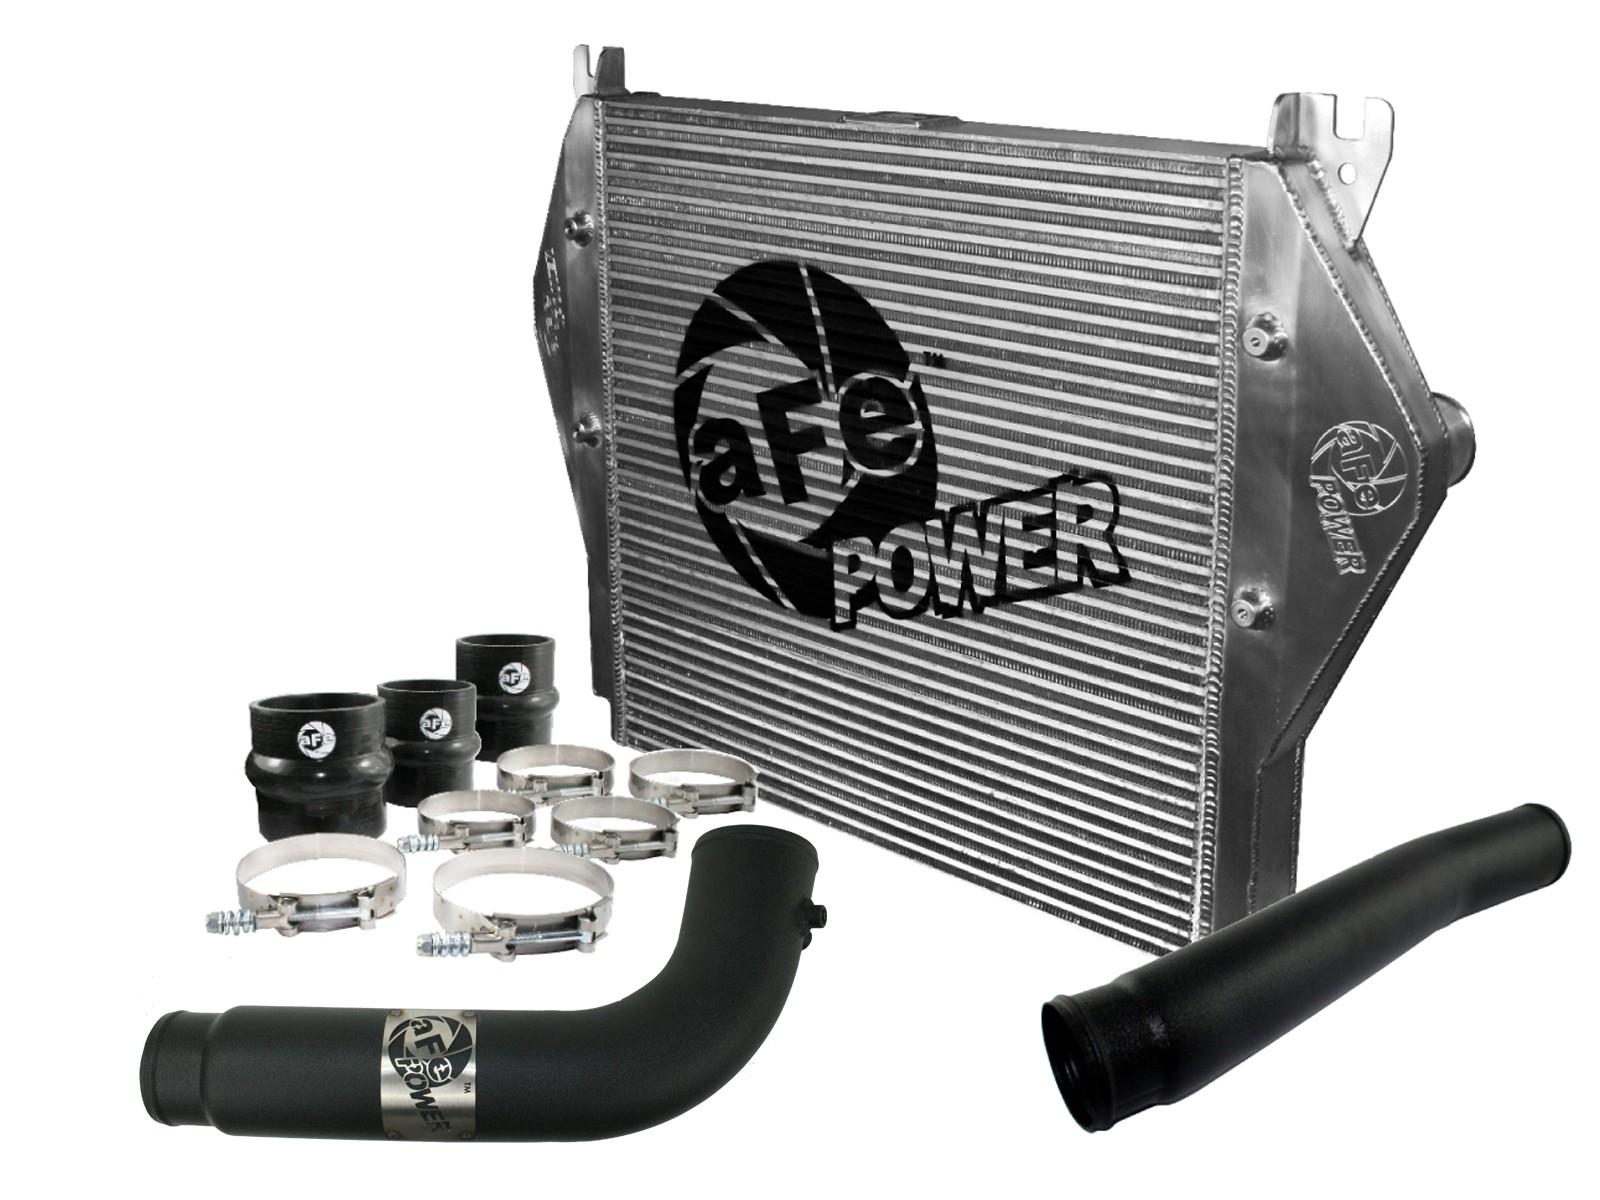 aFe POWER 46-20032 BladeRunner GT Series Intercooler with Tubes